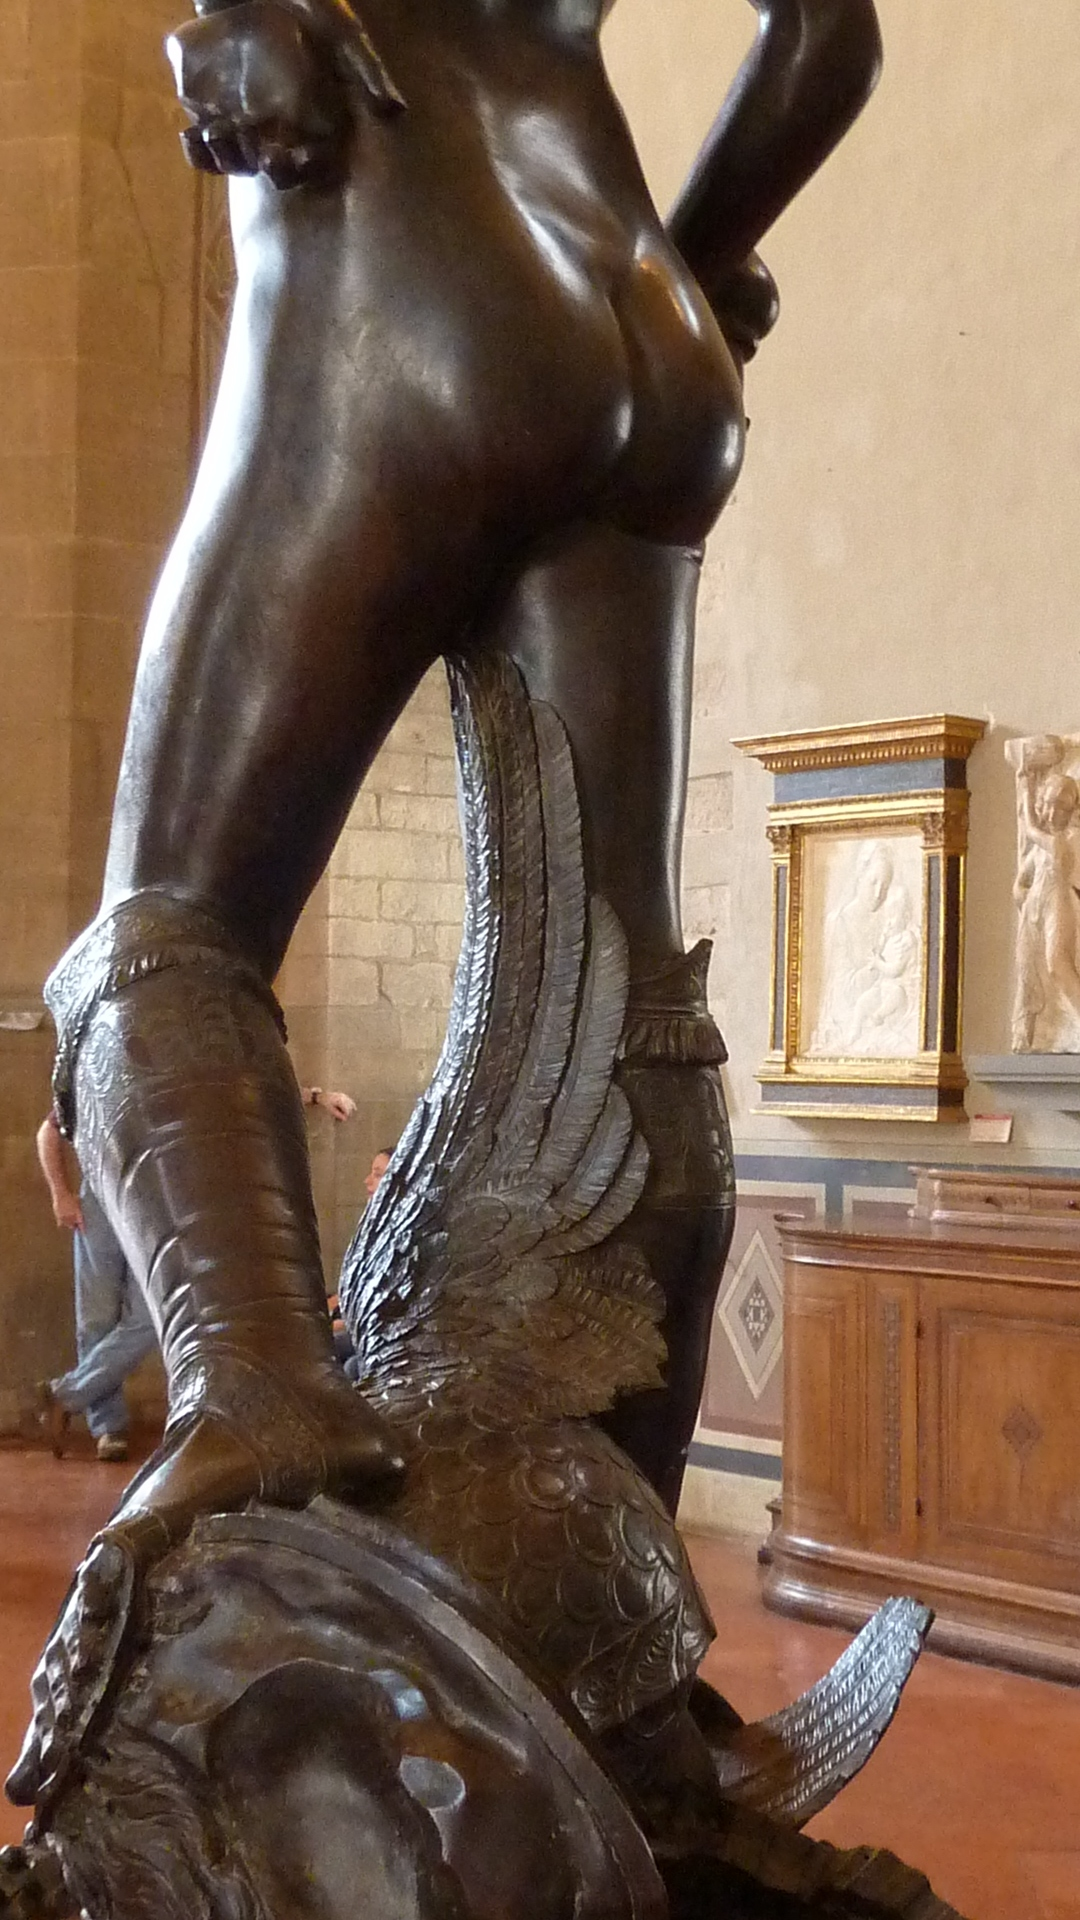 File:Donatello, David (bronze) detail of legs.JPG ...